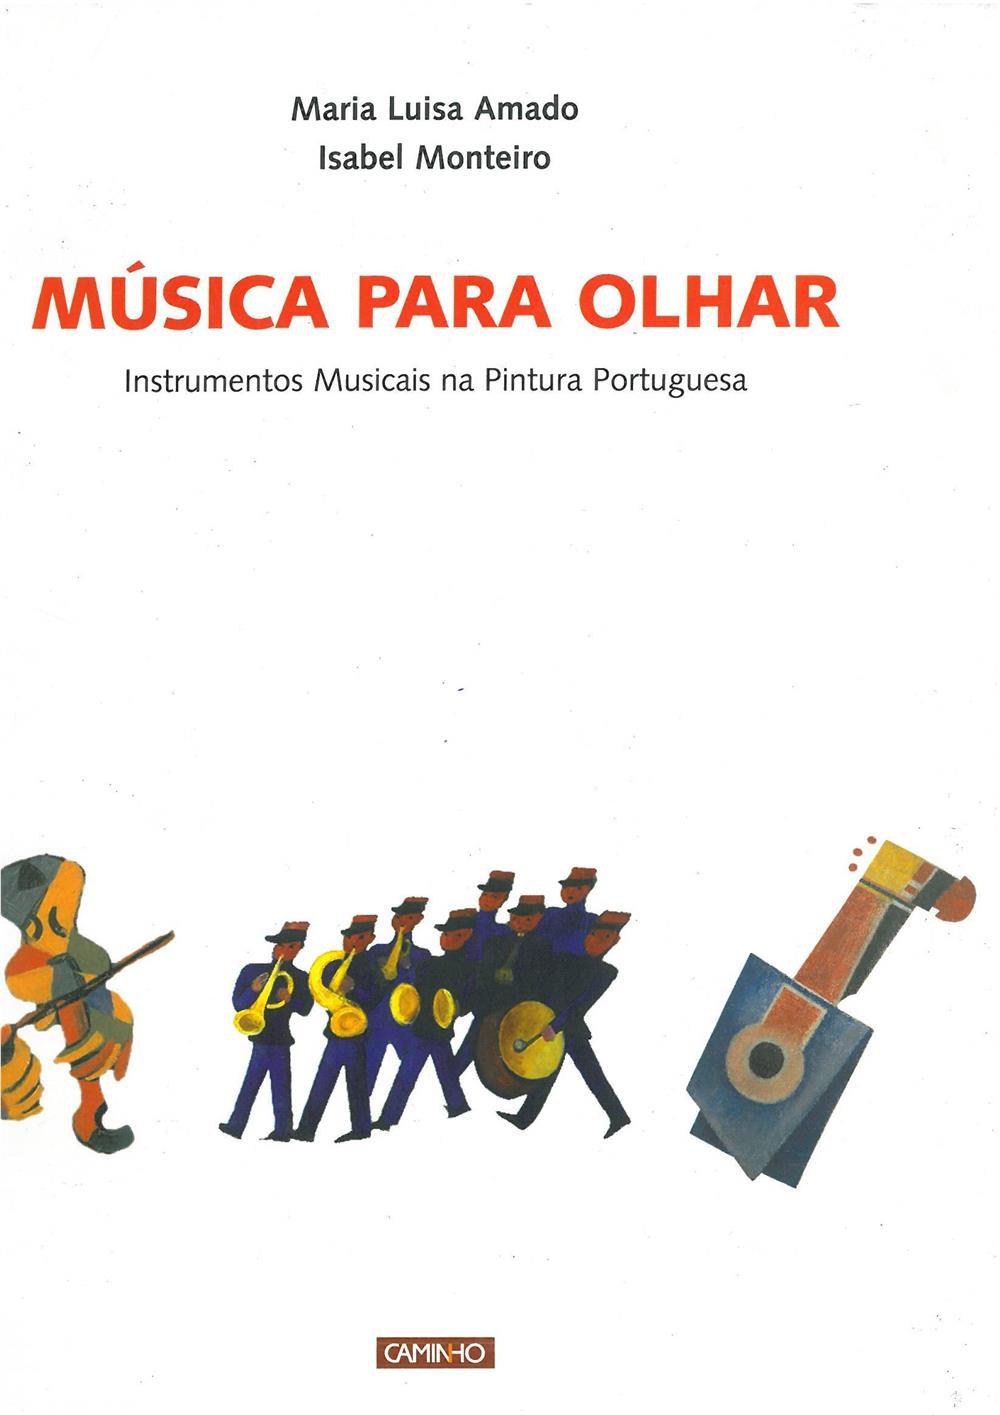 Música para olhar_.jpg